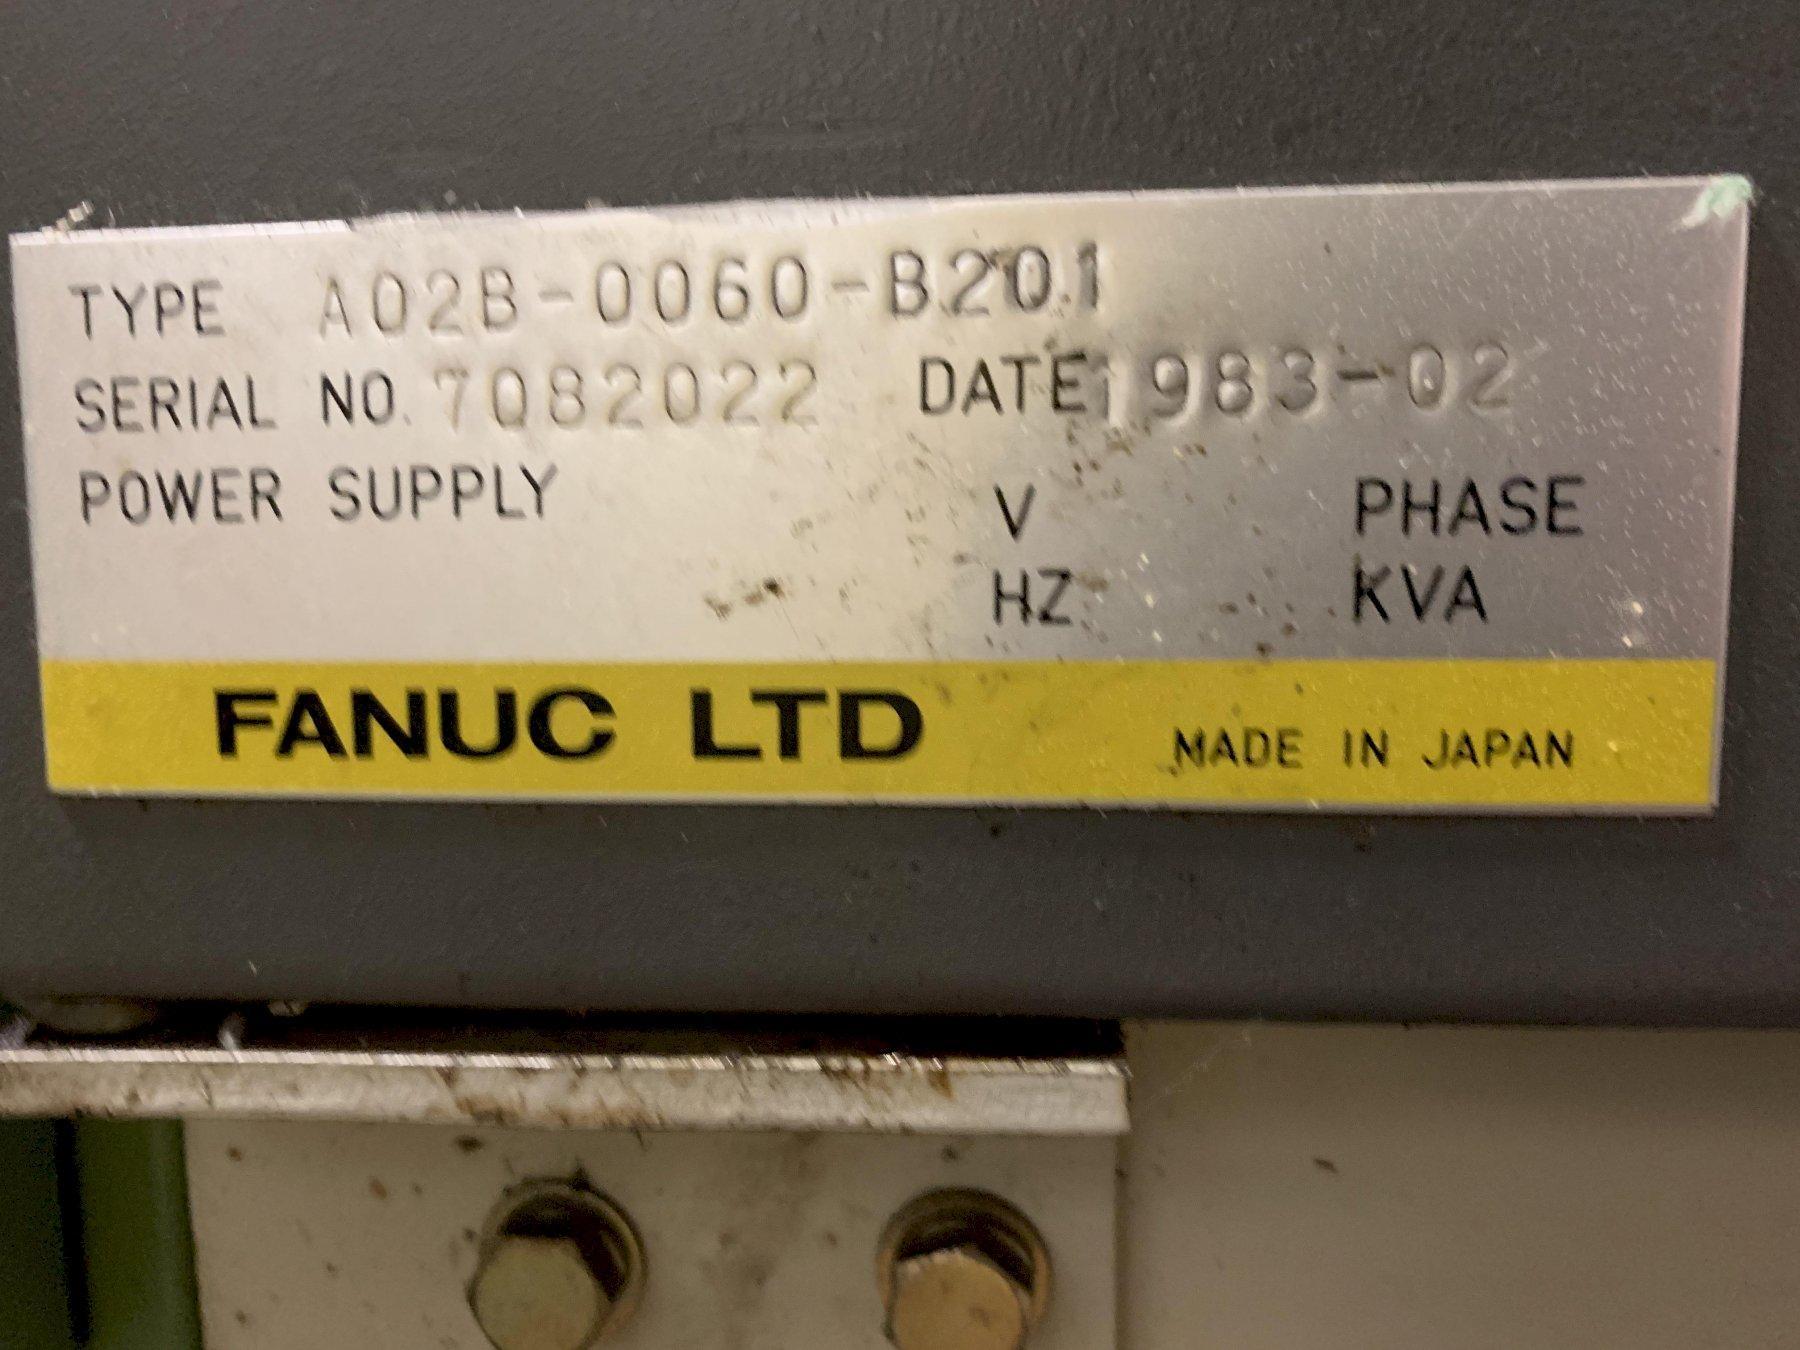 "MORI SEIKIMori Seiki MV-40, 1983, 30"" x 13.8"" x 17.7"", 6K RPM, BT40, 20 ATC, Fanuc 6M CNC Control"